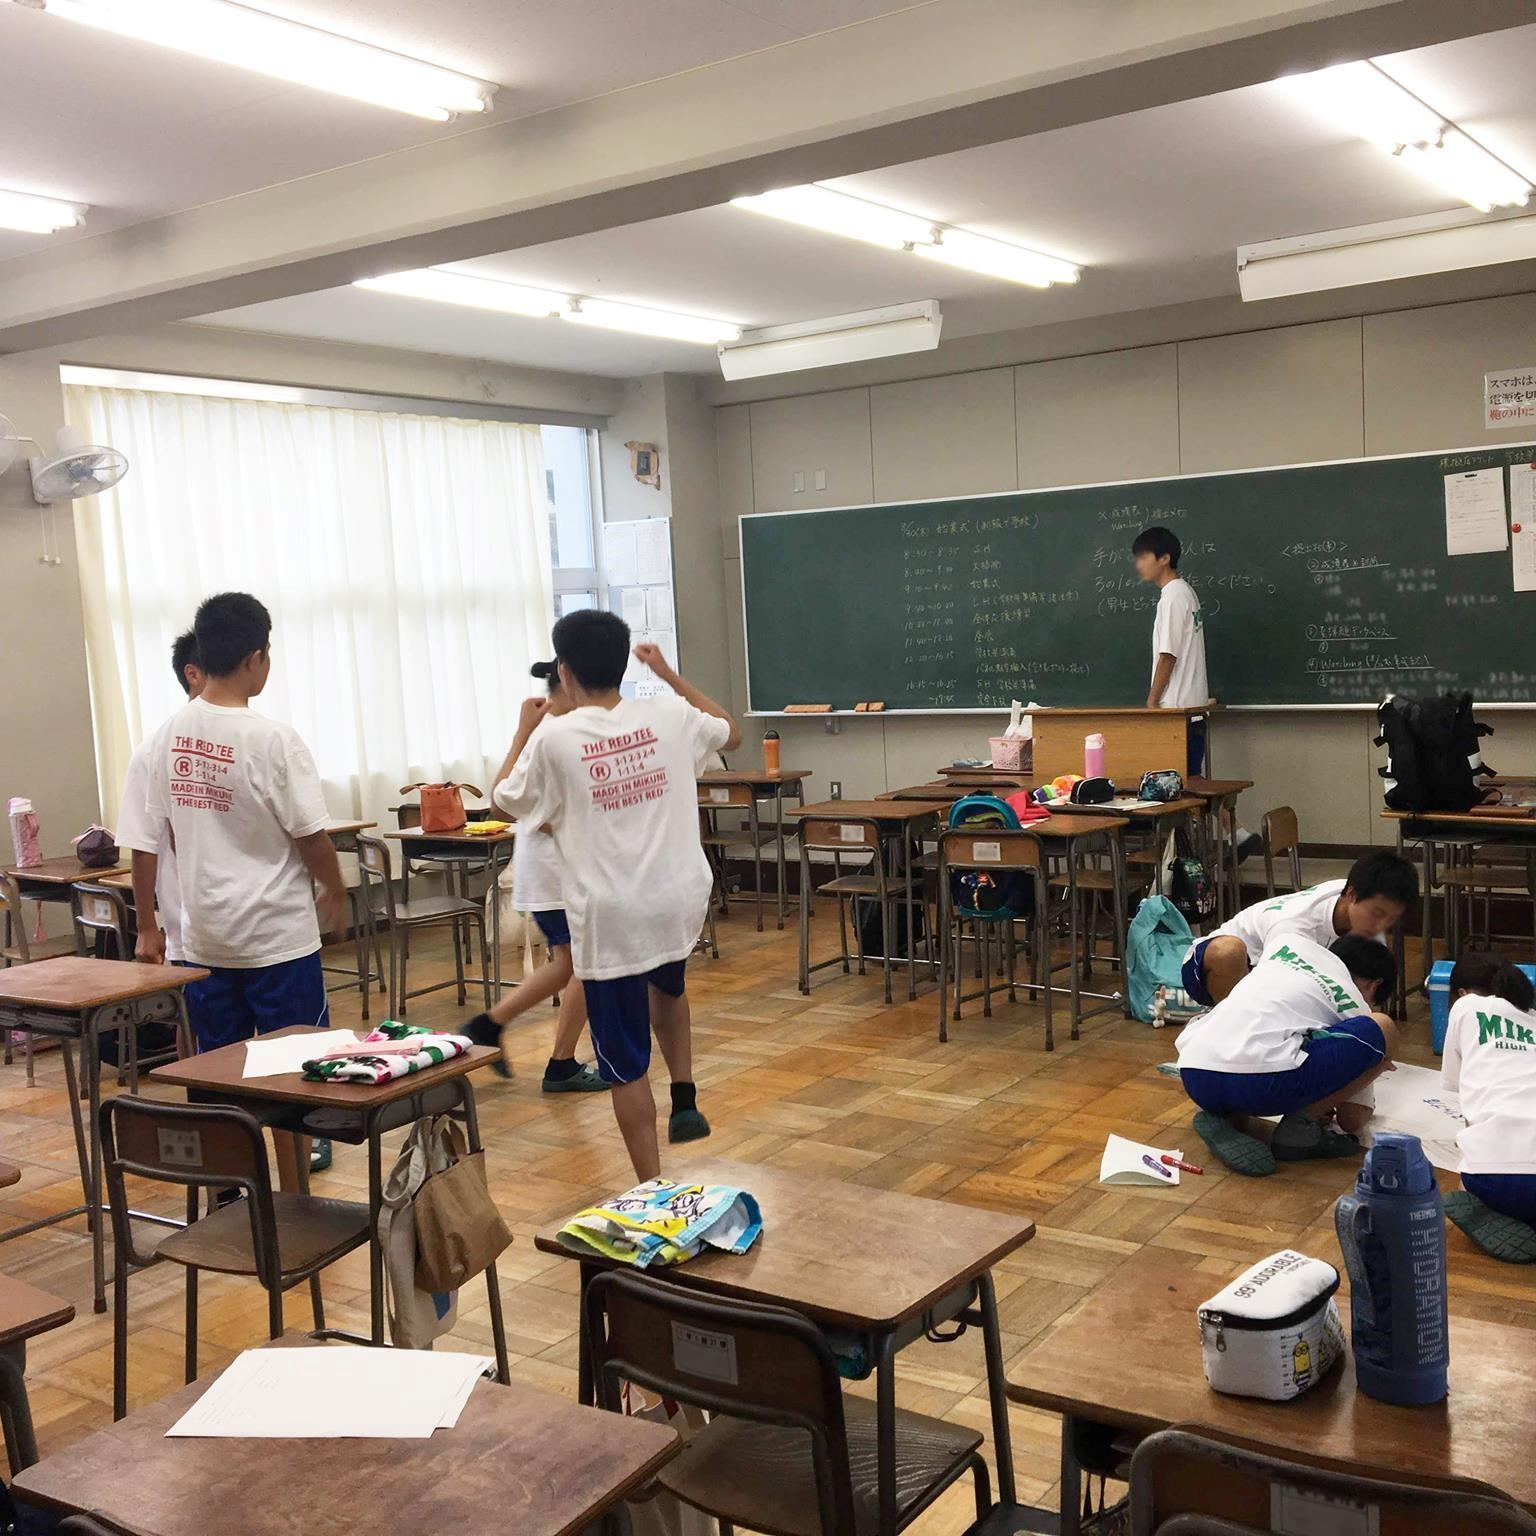 http://ud.t.u-tokyo.ac.jp/blog/_images/mikuni1.jpg